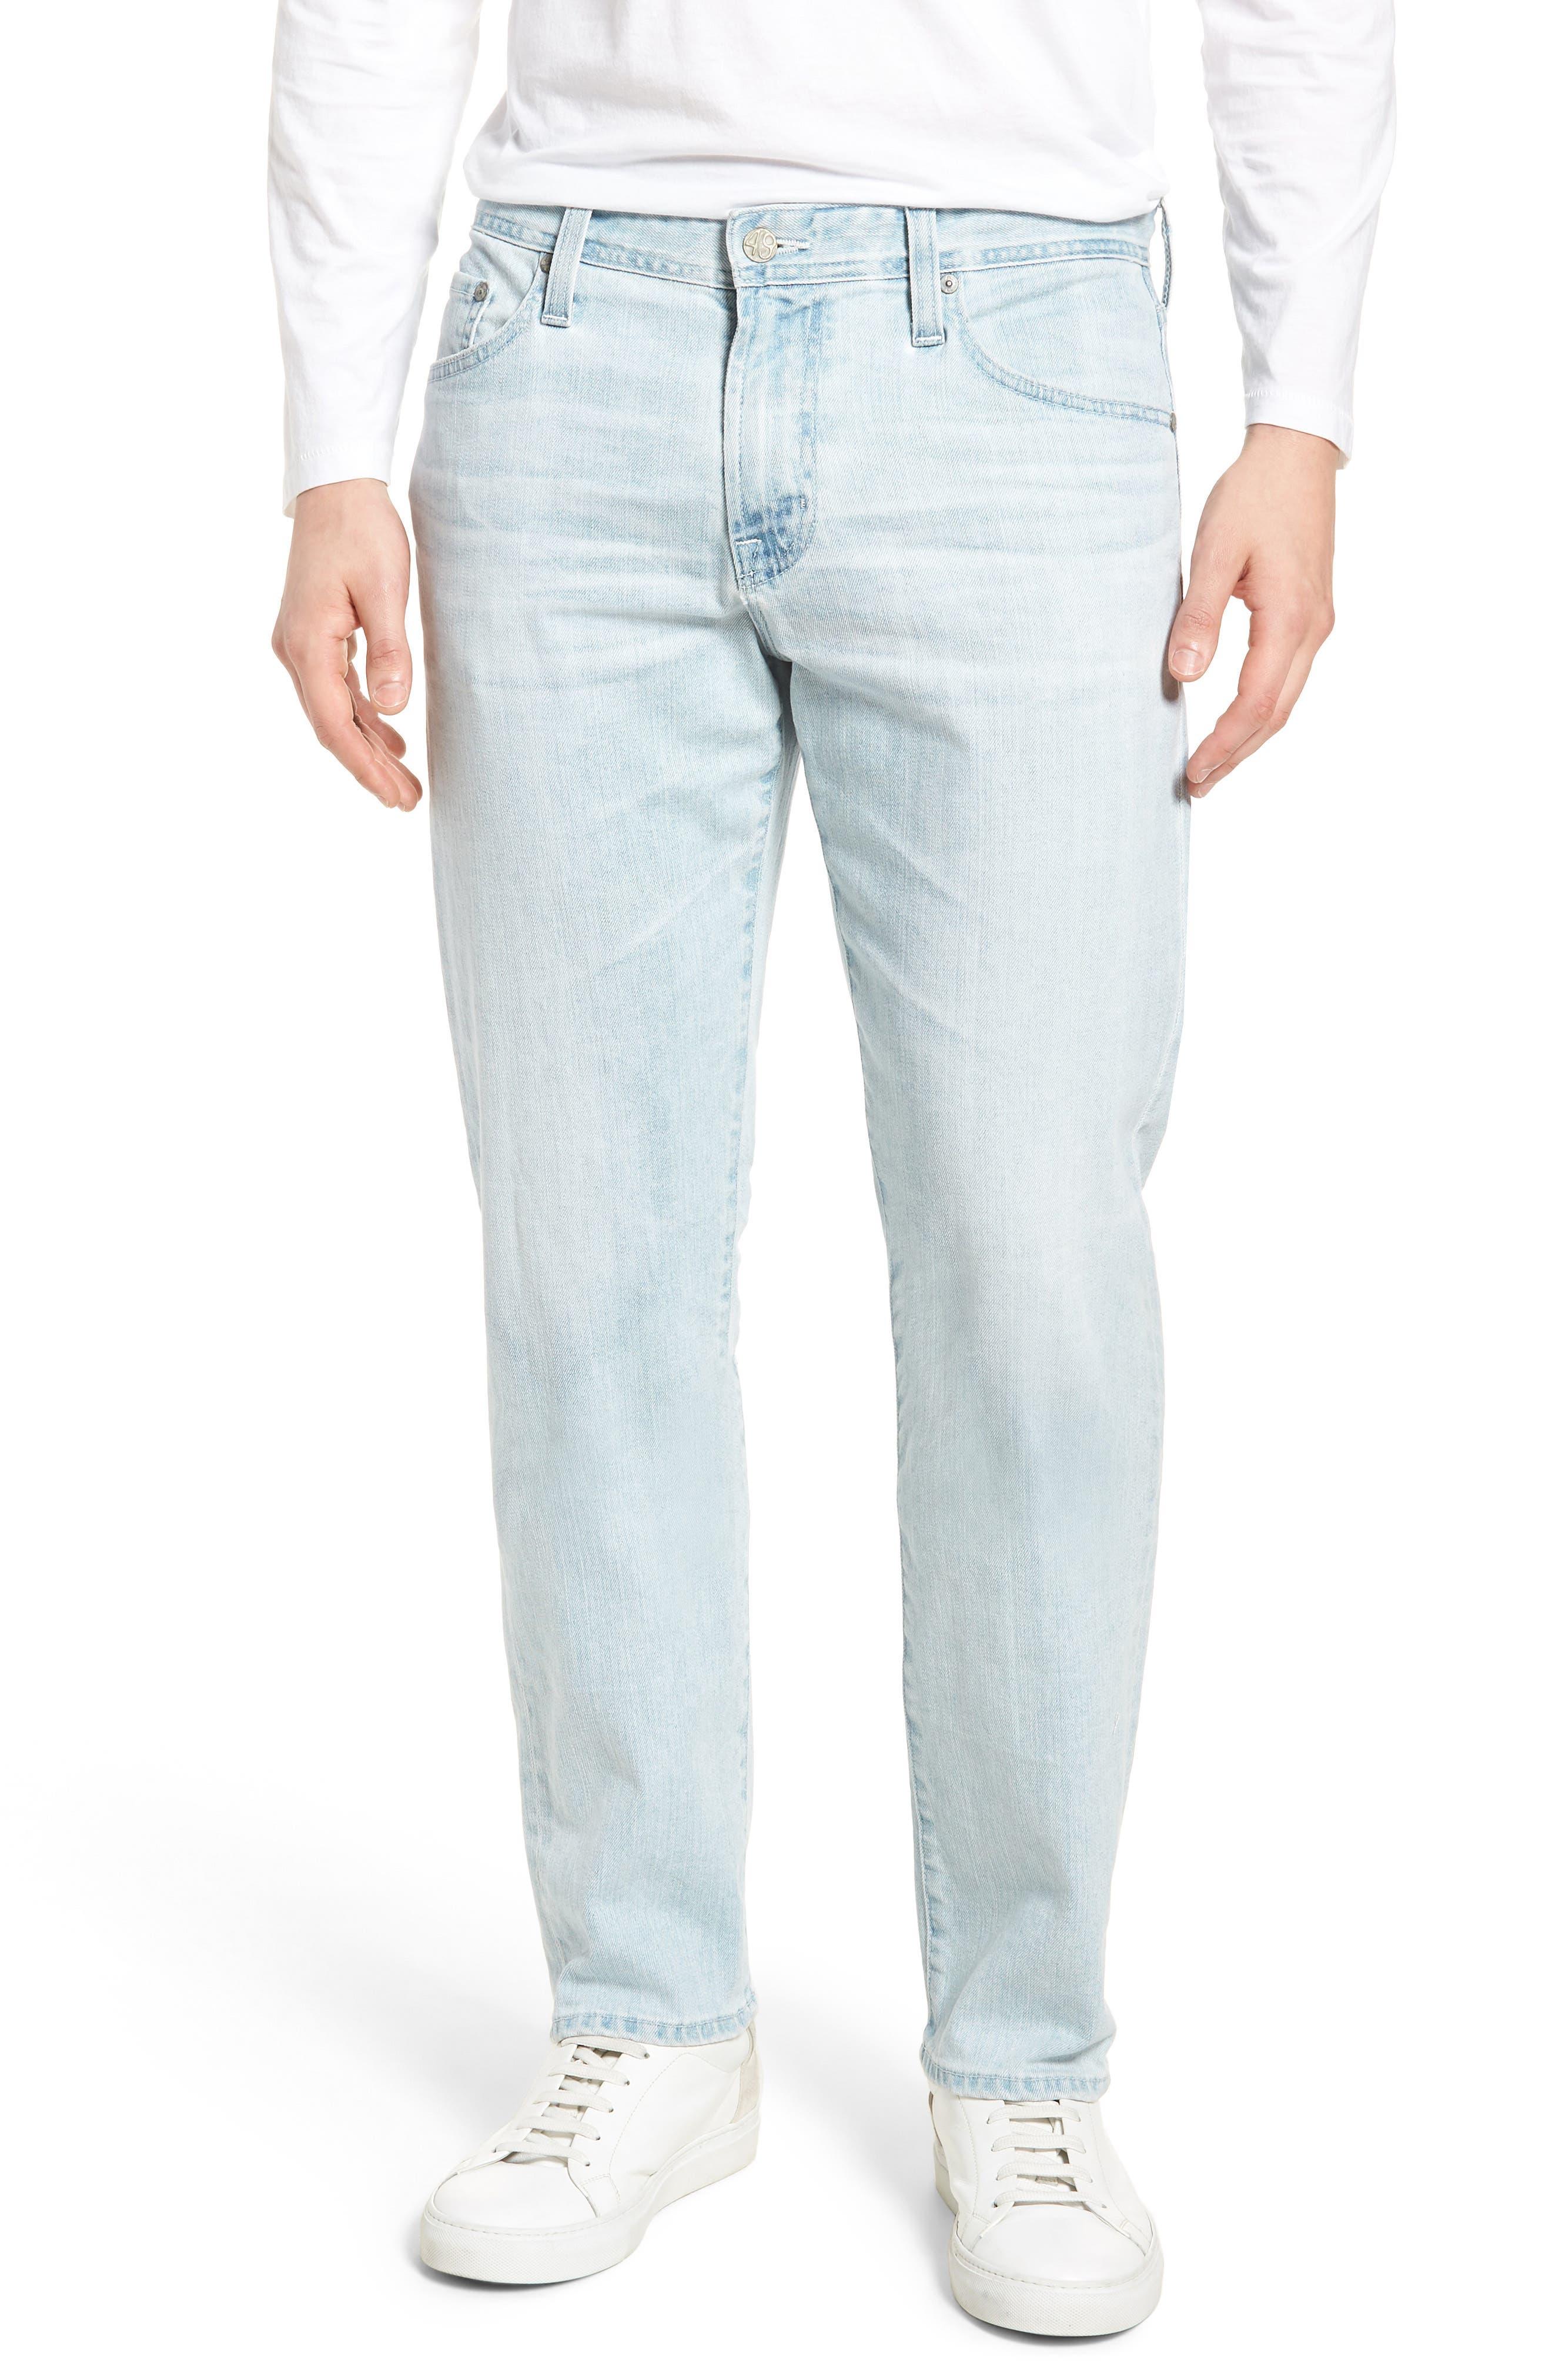 Graduate Slim Straight Leg Jeans,                             Main thumbnail 1, color,                             27 Years Bayside